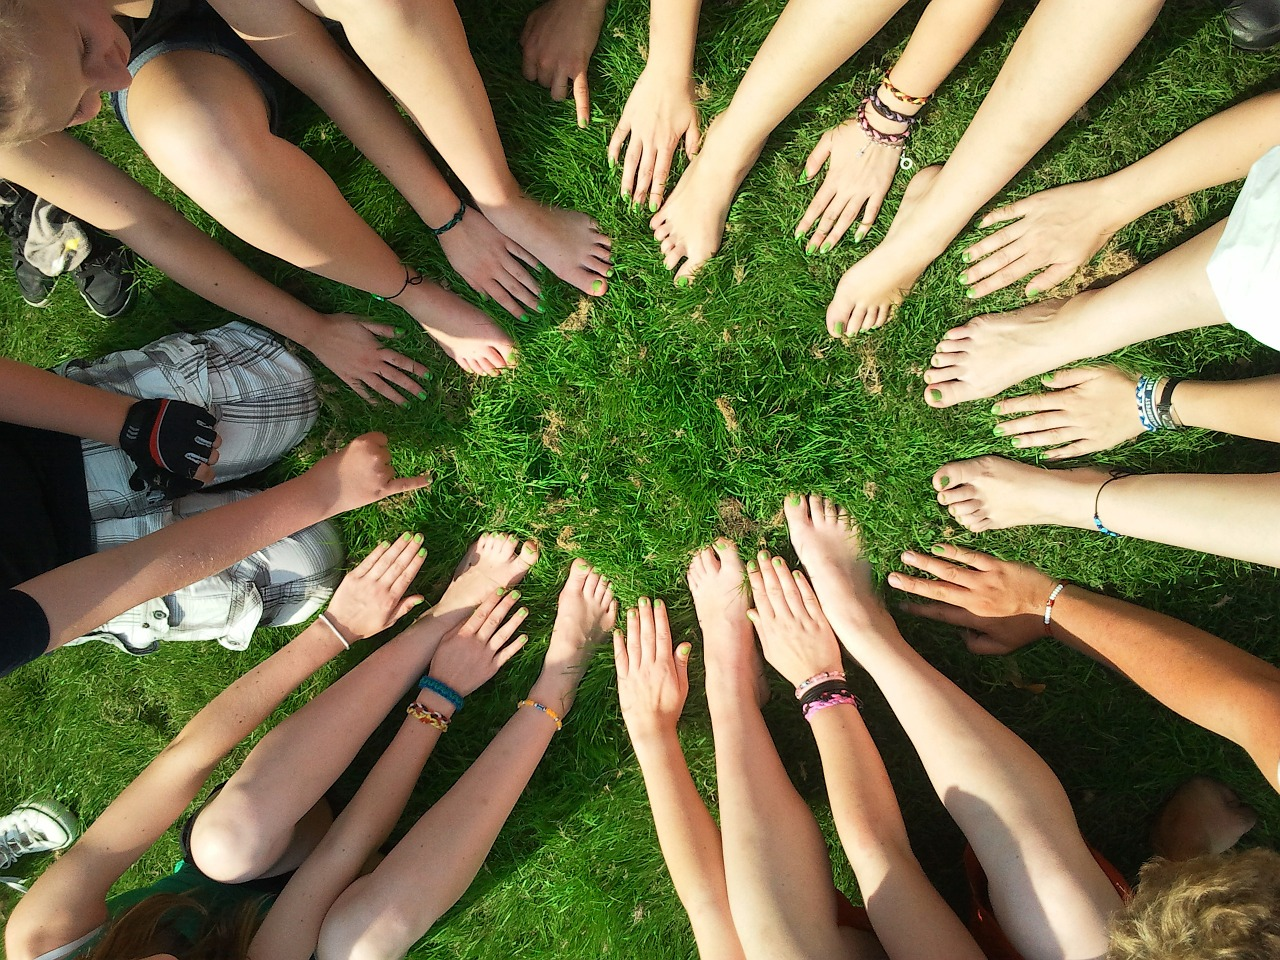 Undoing Social Barriers - 5 Ways to Repair Community Spirit